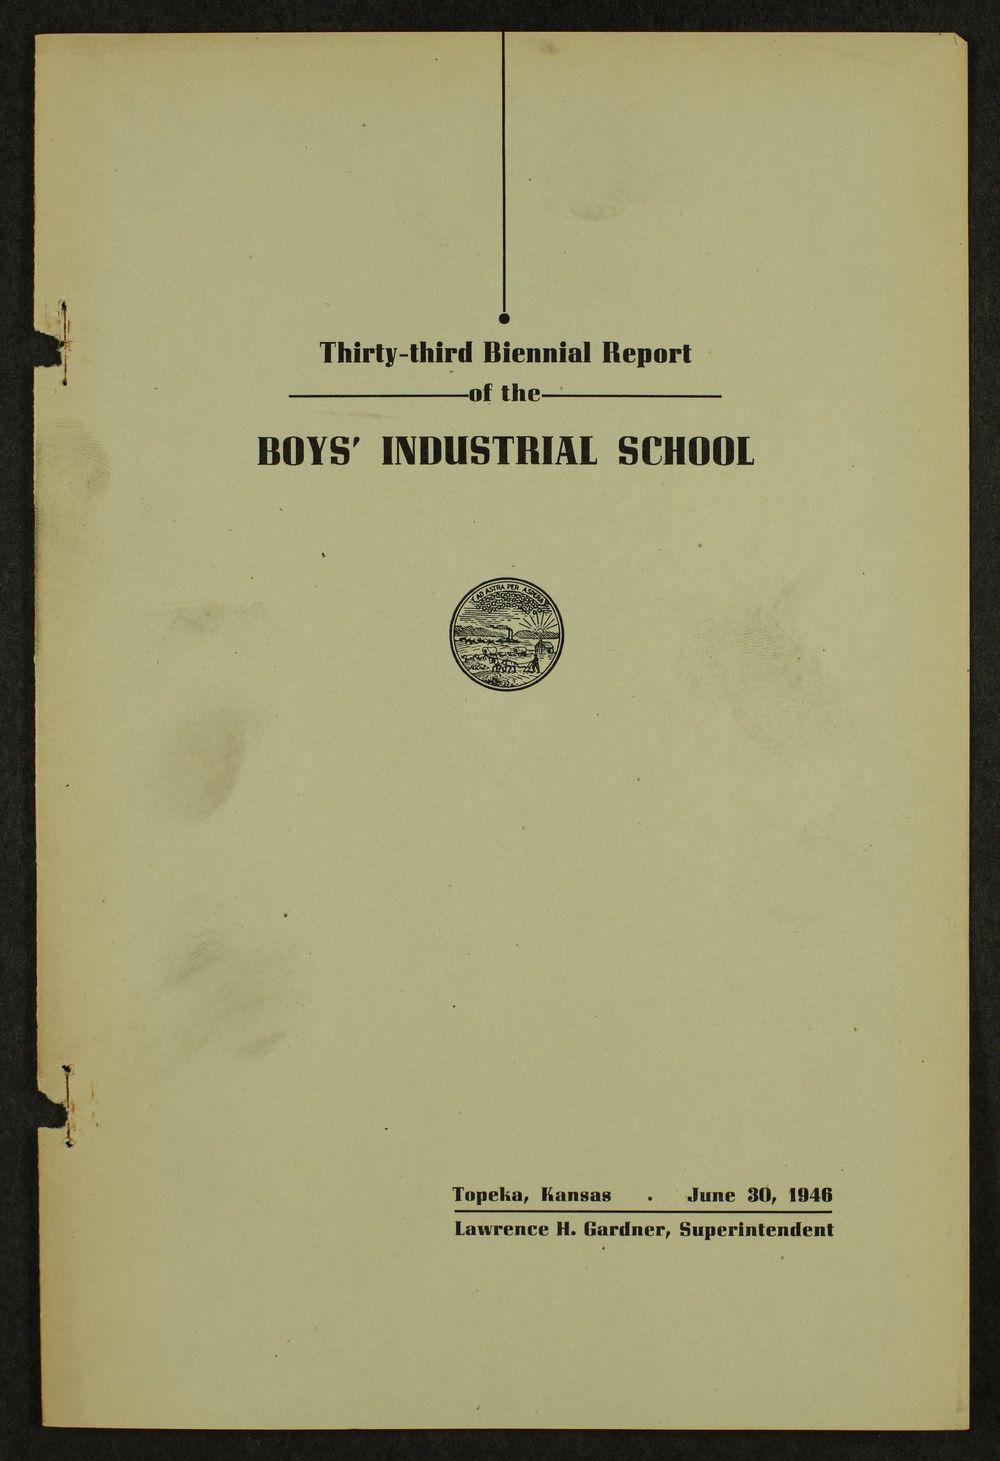 Biennial report of the Boys Industrial School, 1946 - 1